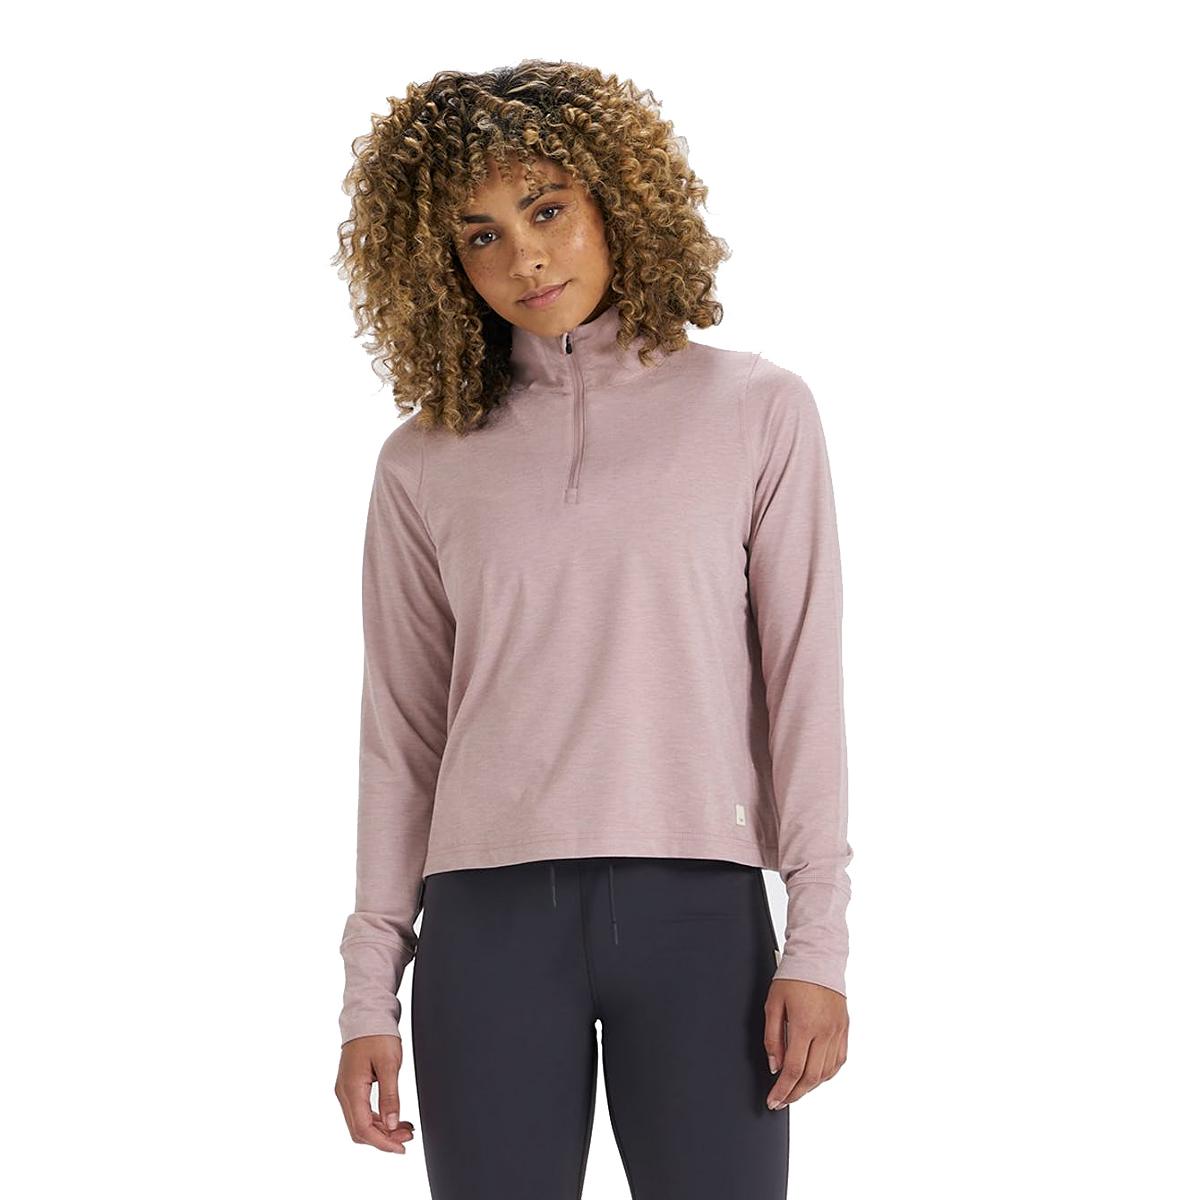 Women's Vuori Crescent Half Zip - Color: Dusk Heather - Size: XS, Dusk Heather, large, image 1